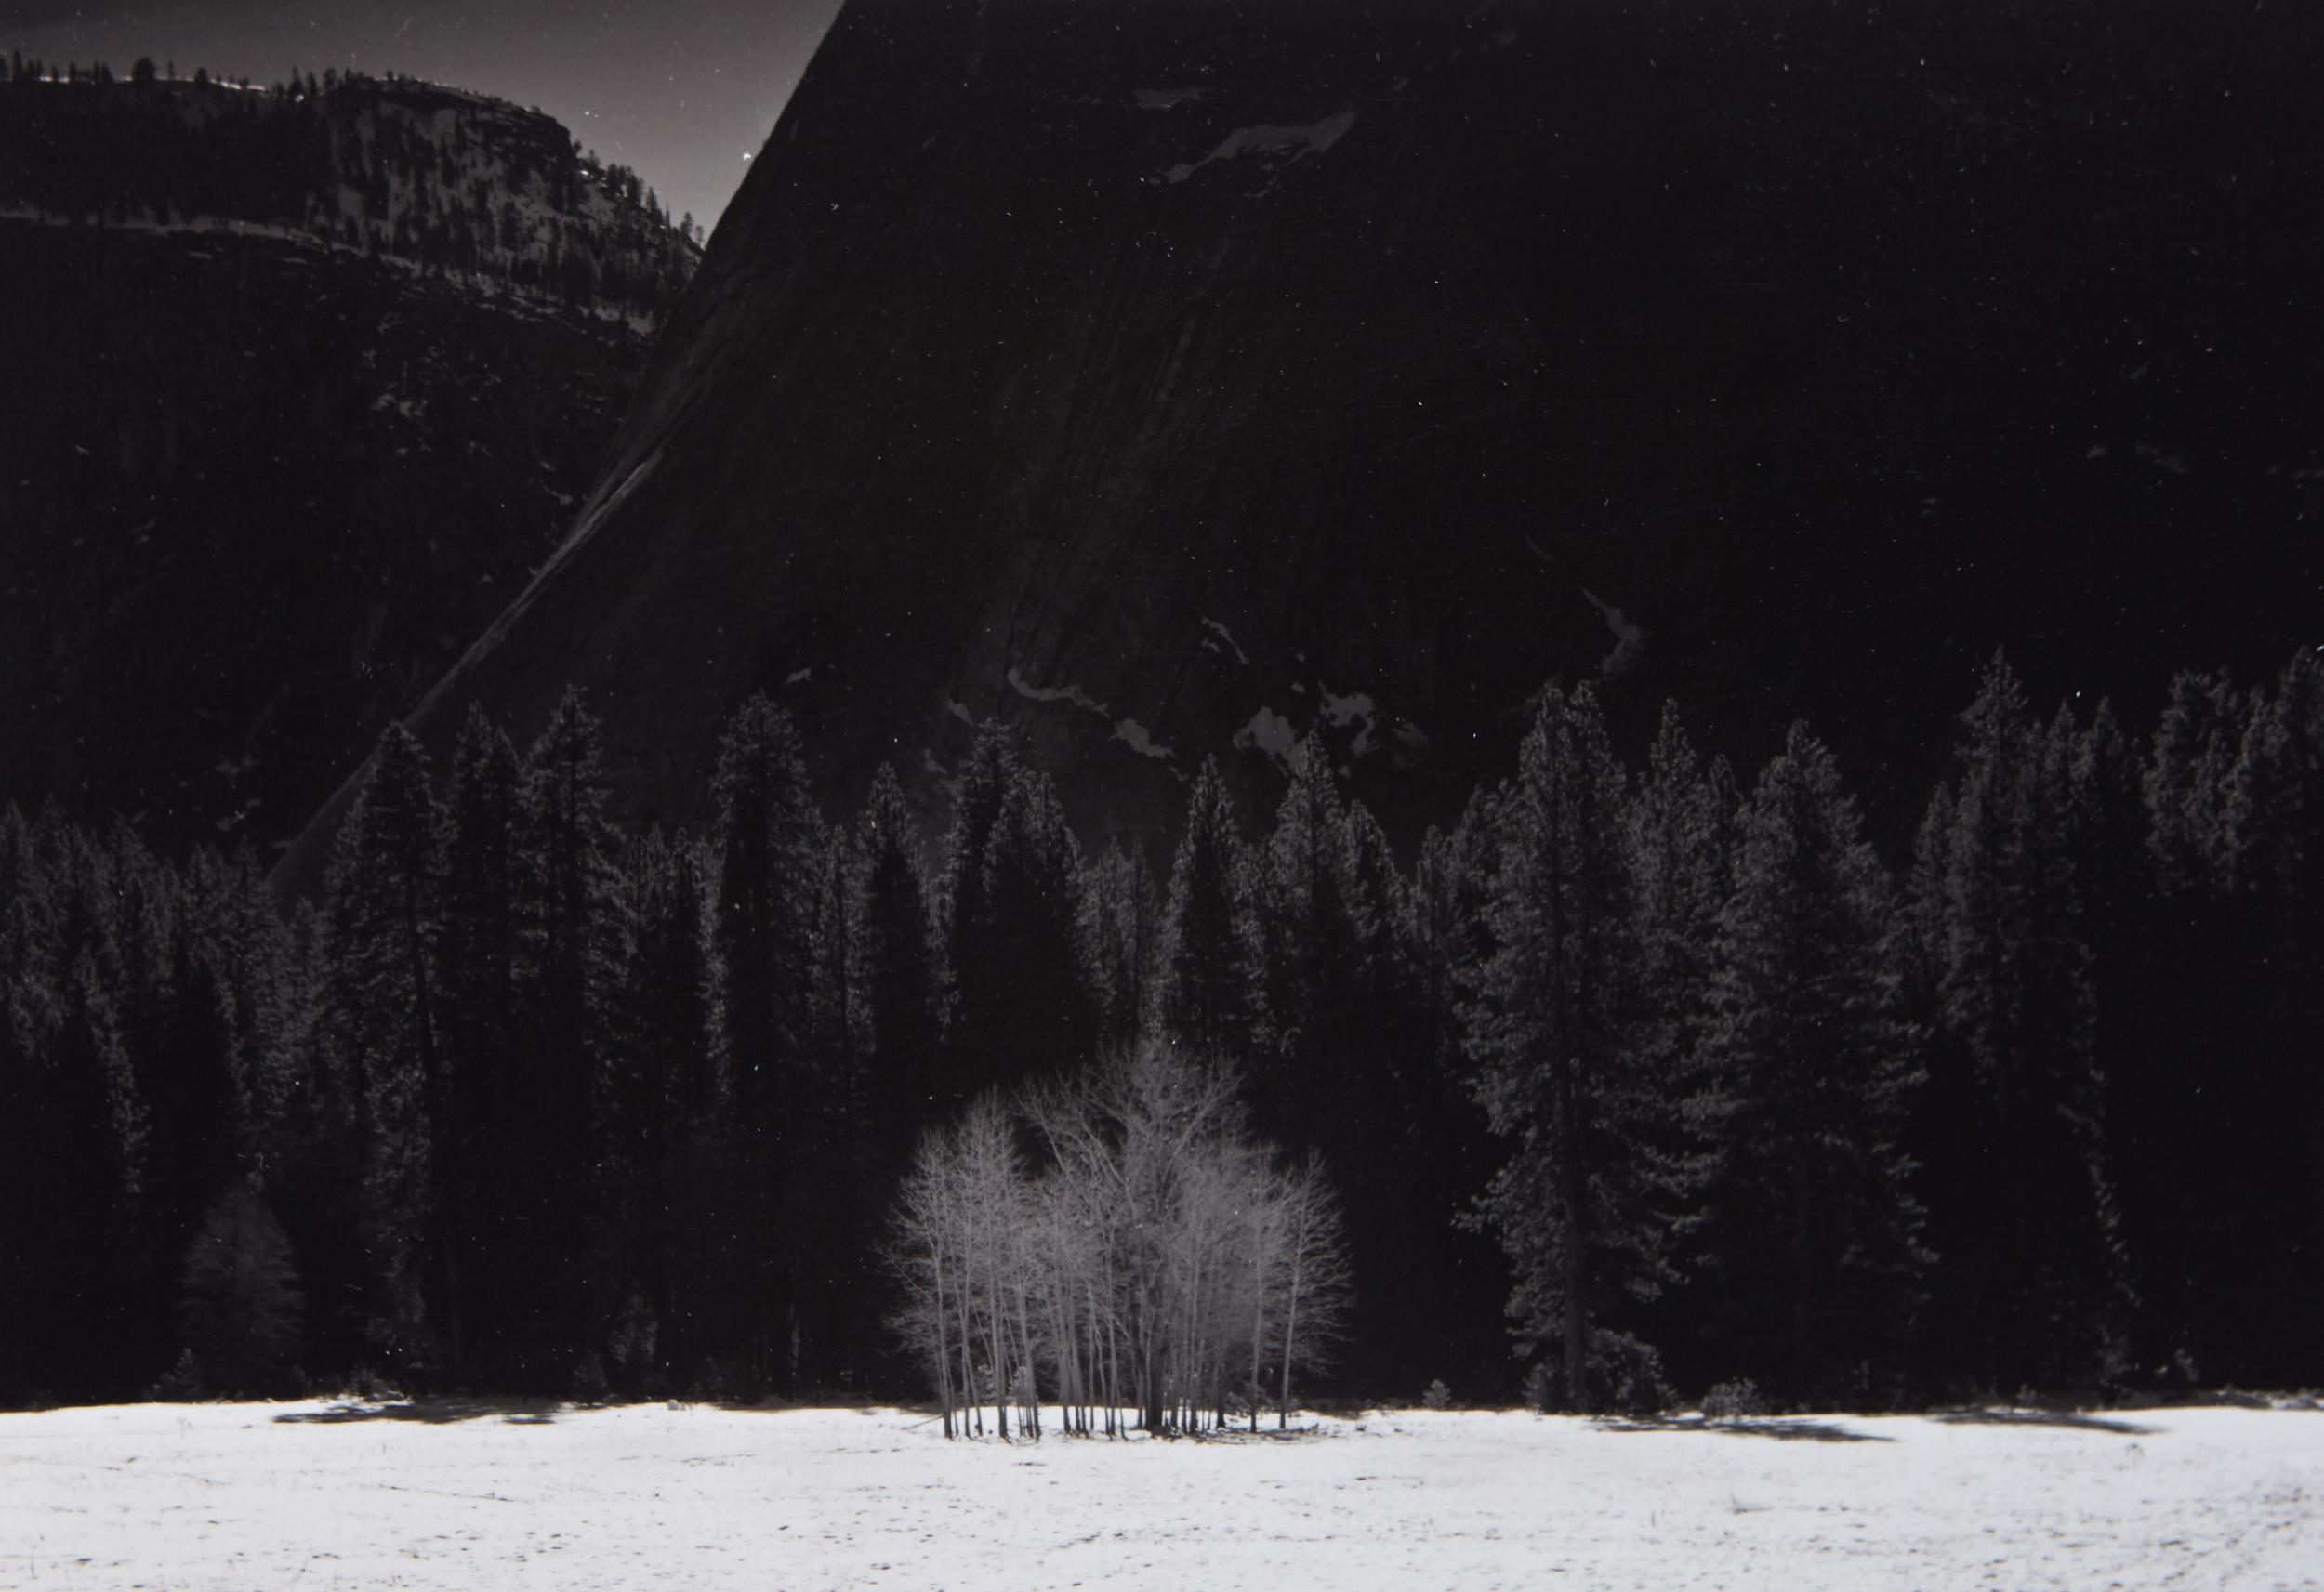 Trees In Snow, Yosemite